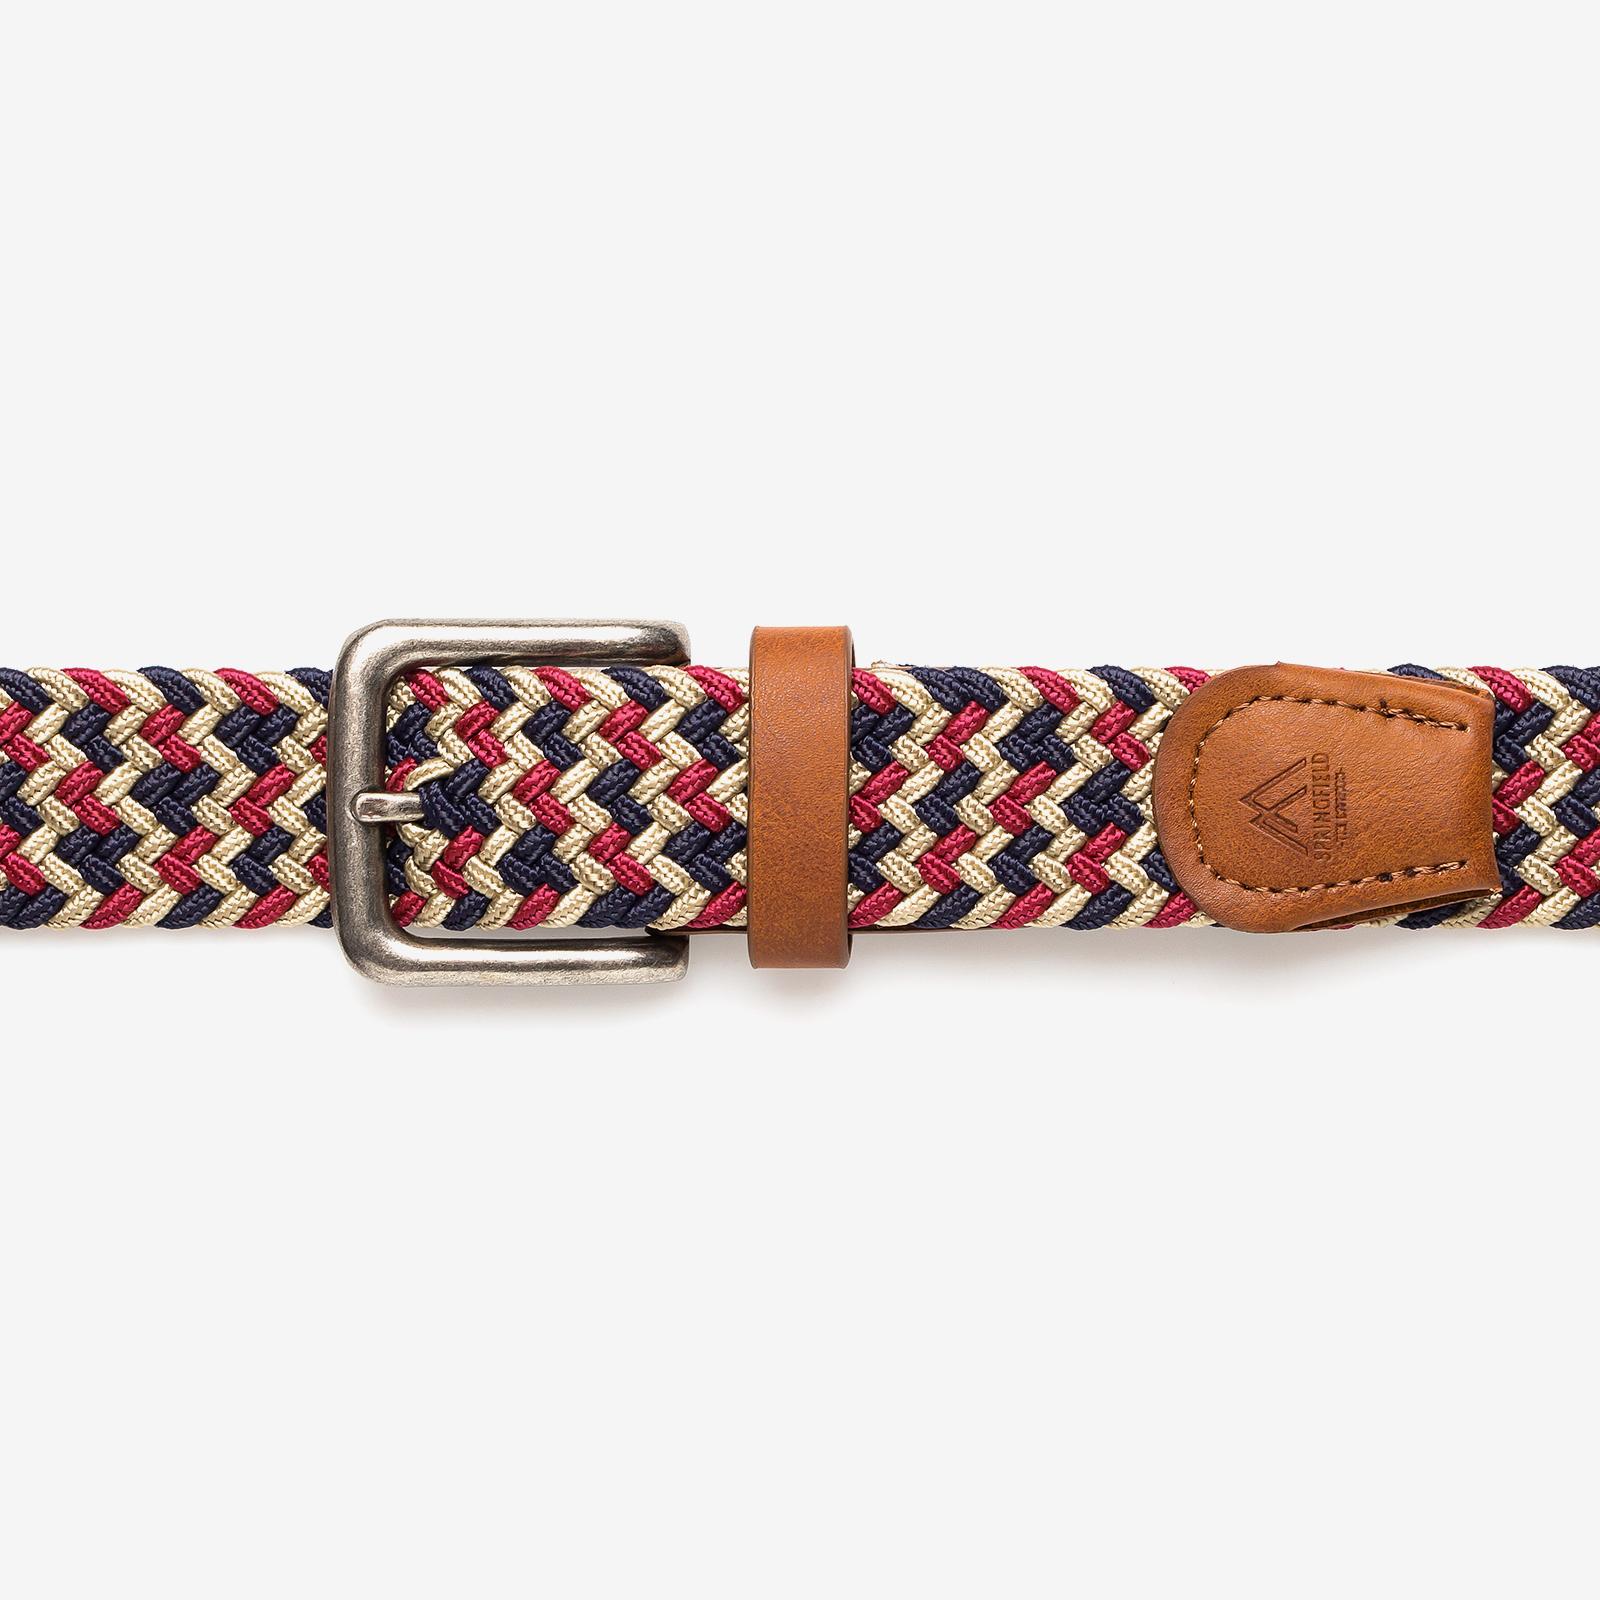 Belt close up product photo